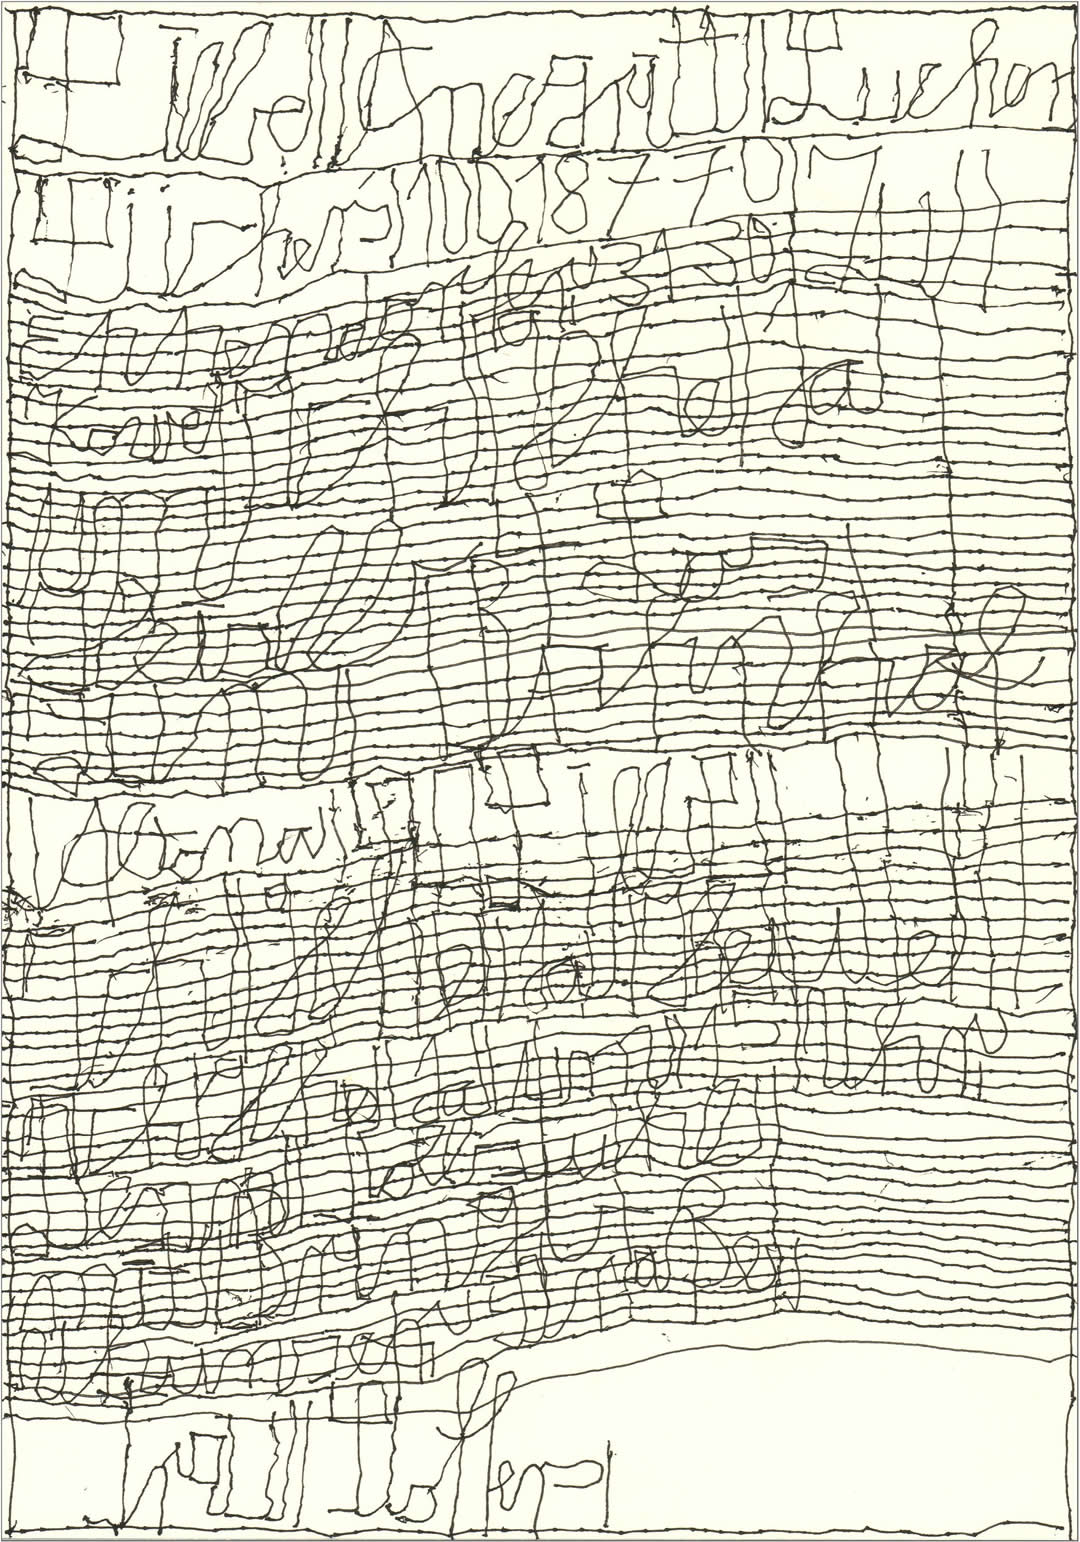 Harald Stoffers | Brief385 2017 | 29,7x21cm | viennacontemporary | Galerie3